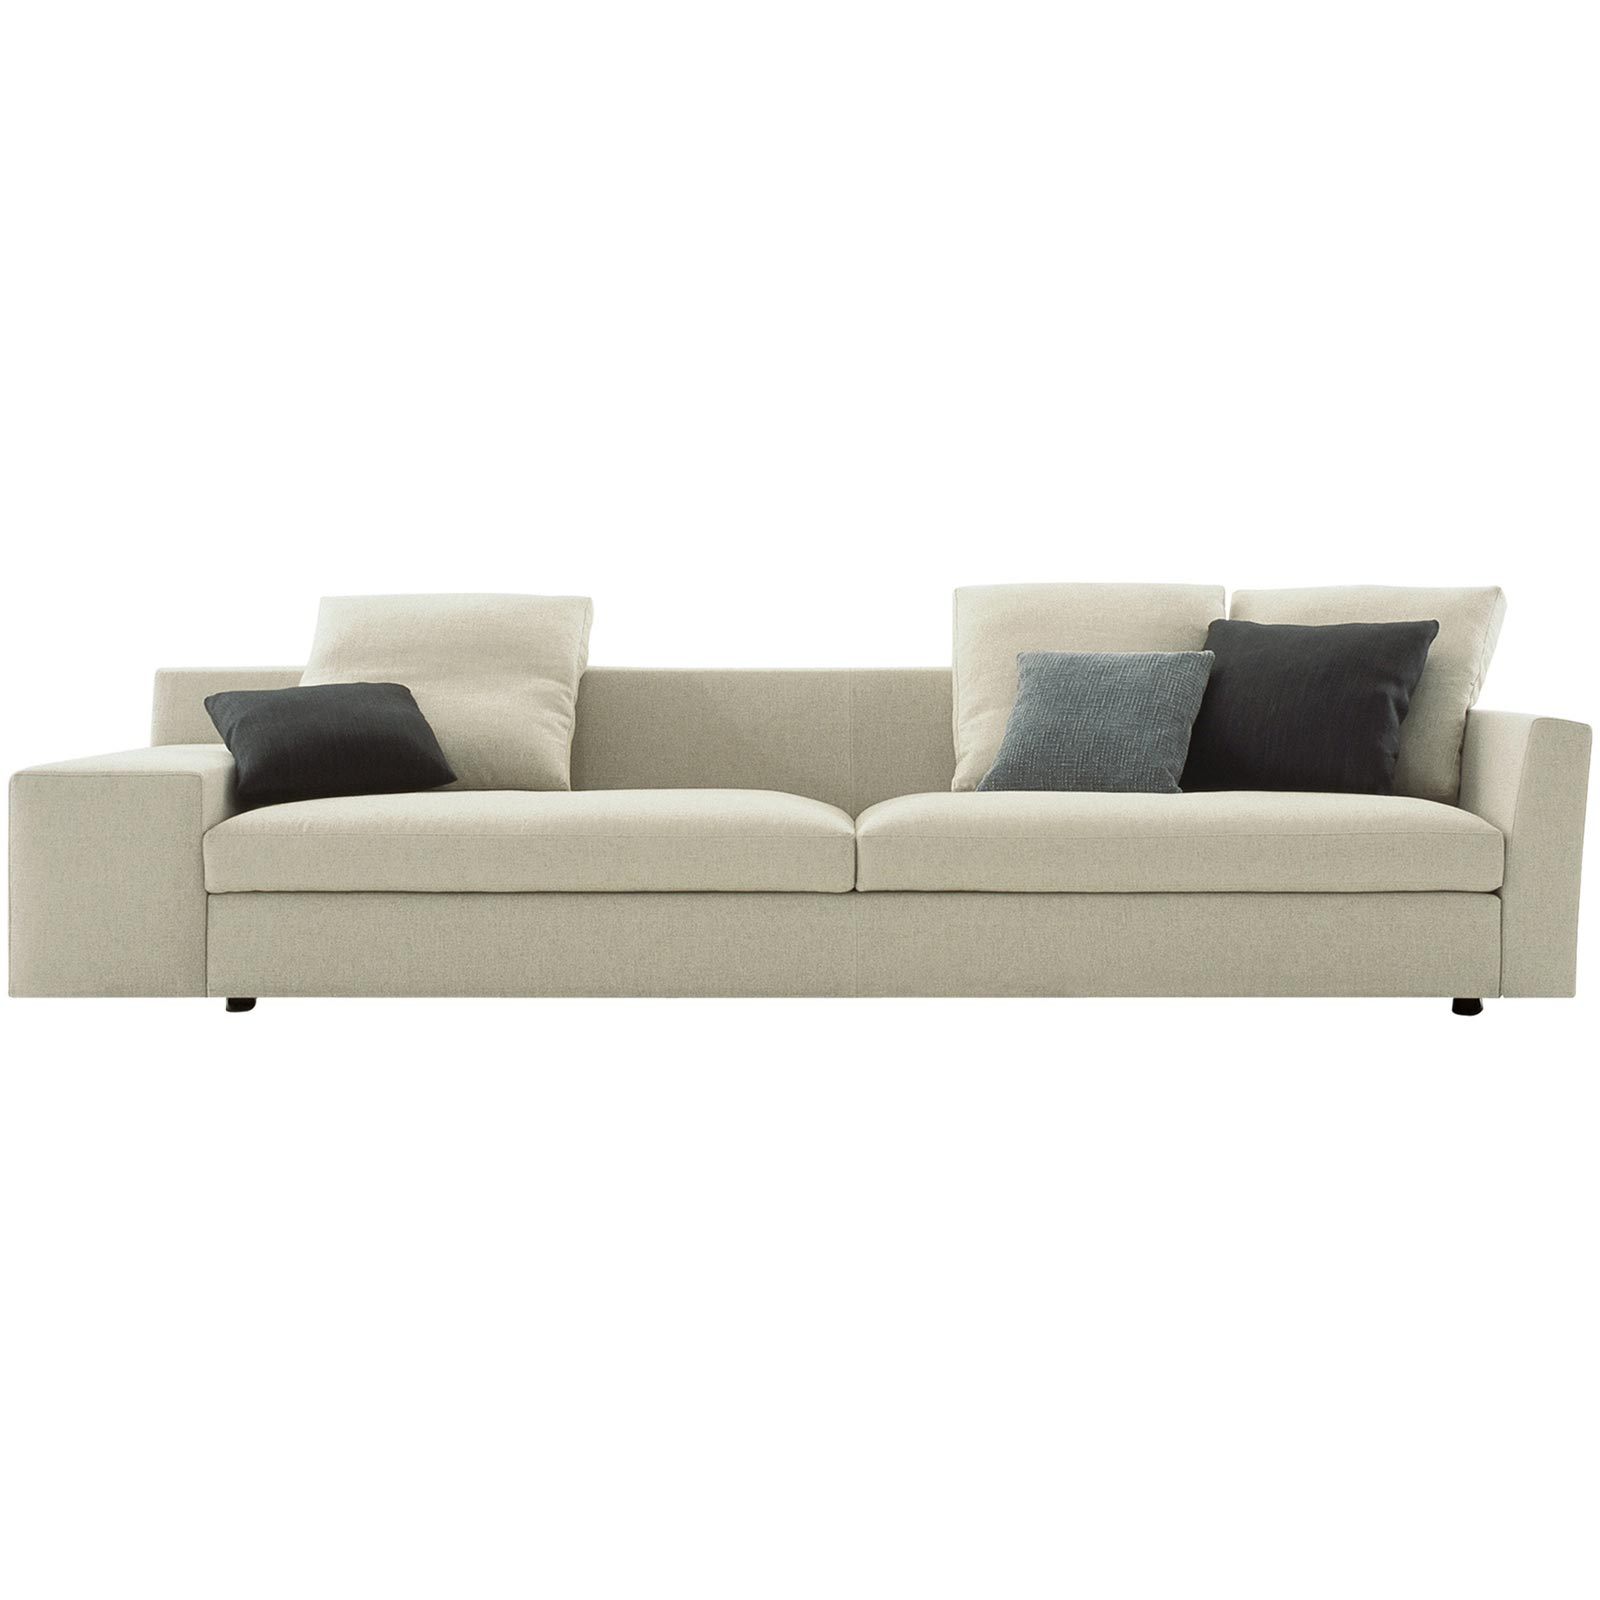 sofa series mister by cassina. Black Bedroom Furniture Sets. Home Design Ideas